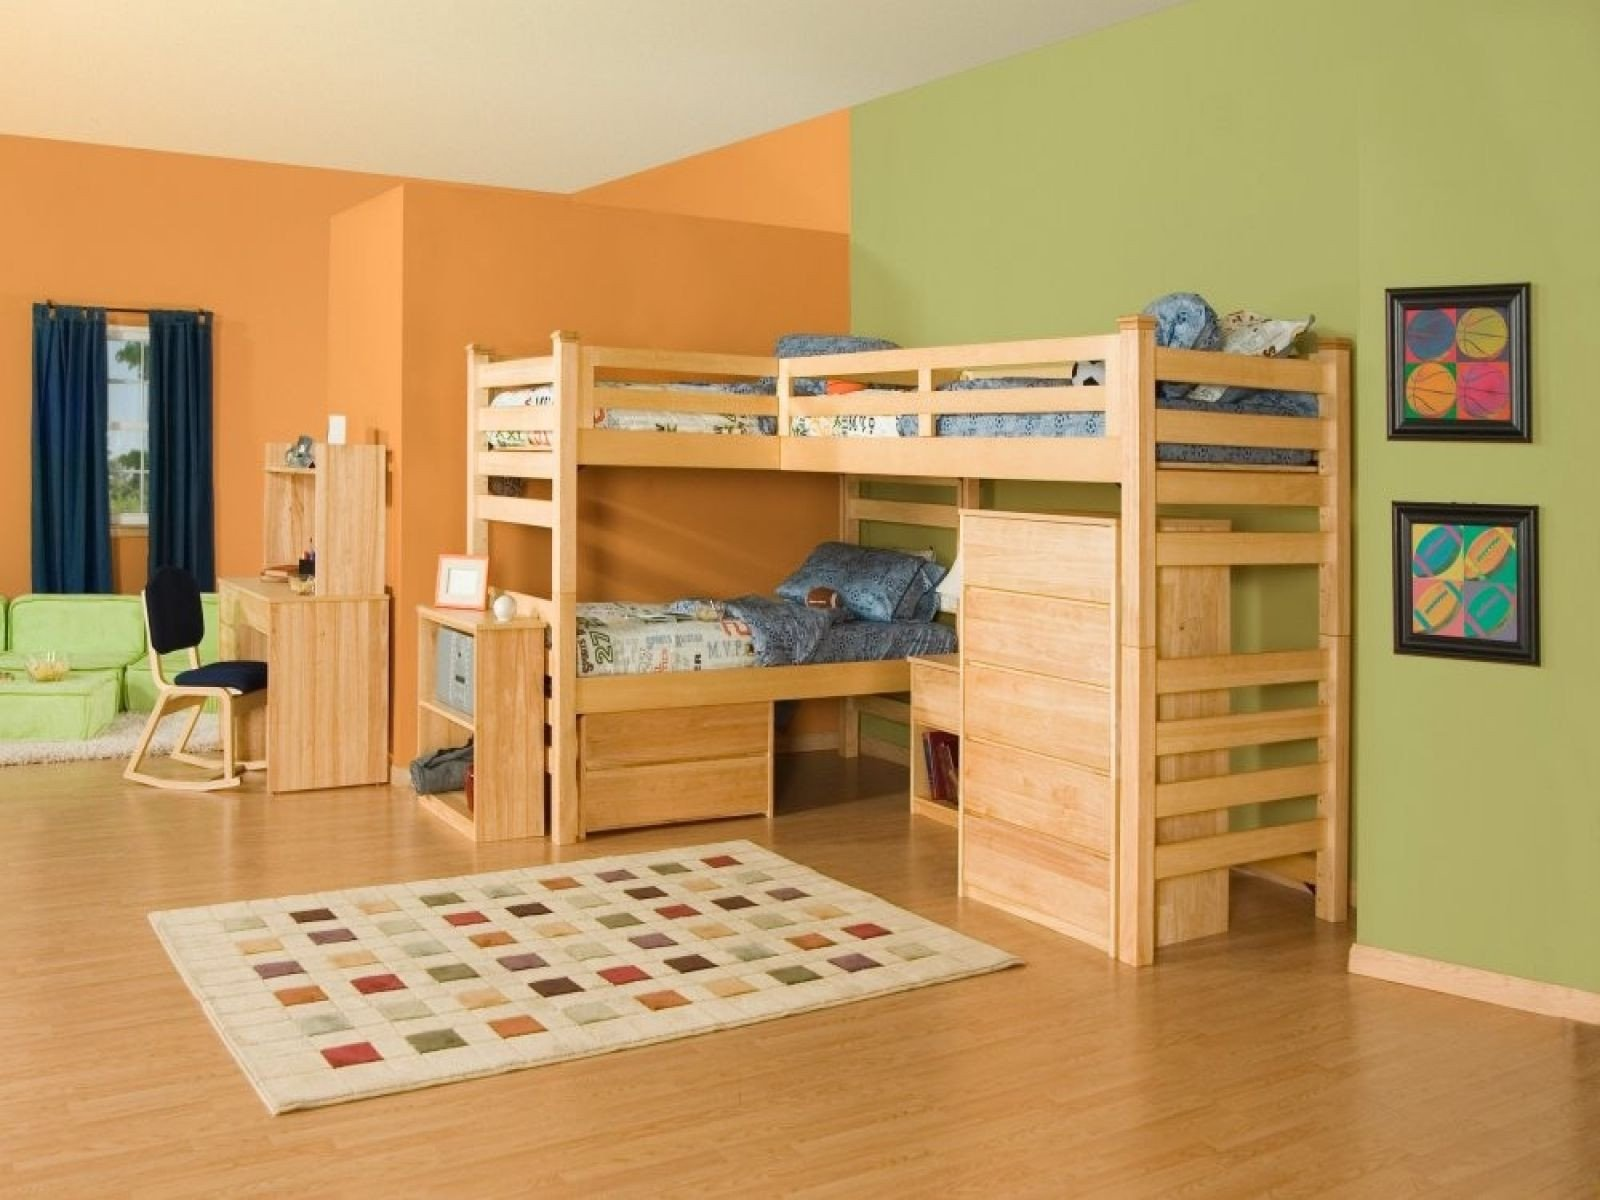 Bedroom Set for Boy Luxury Boys Bedroom Sets